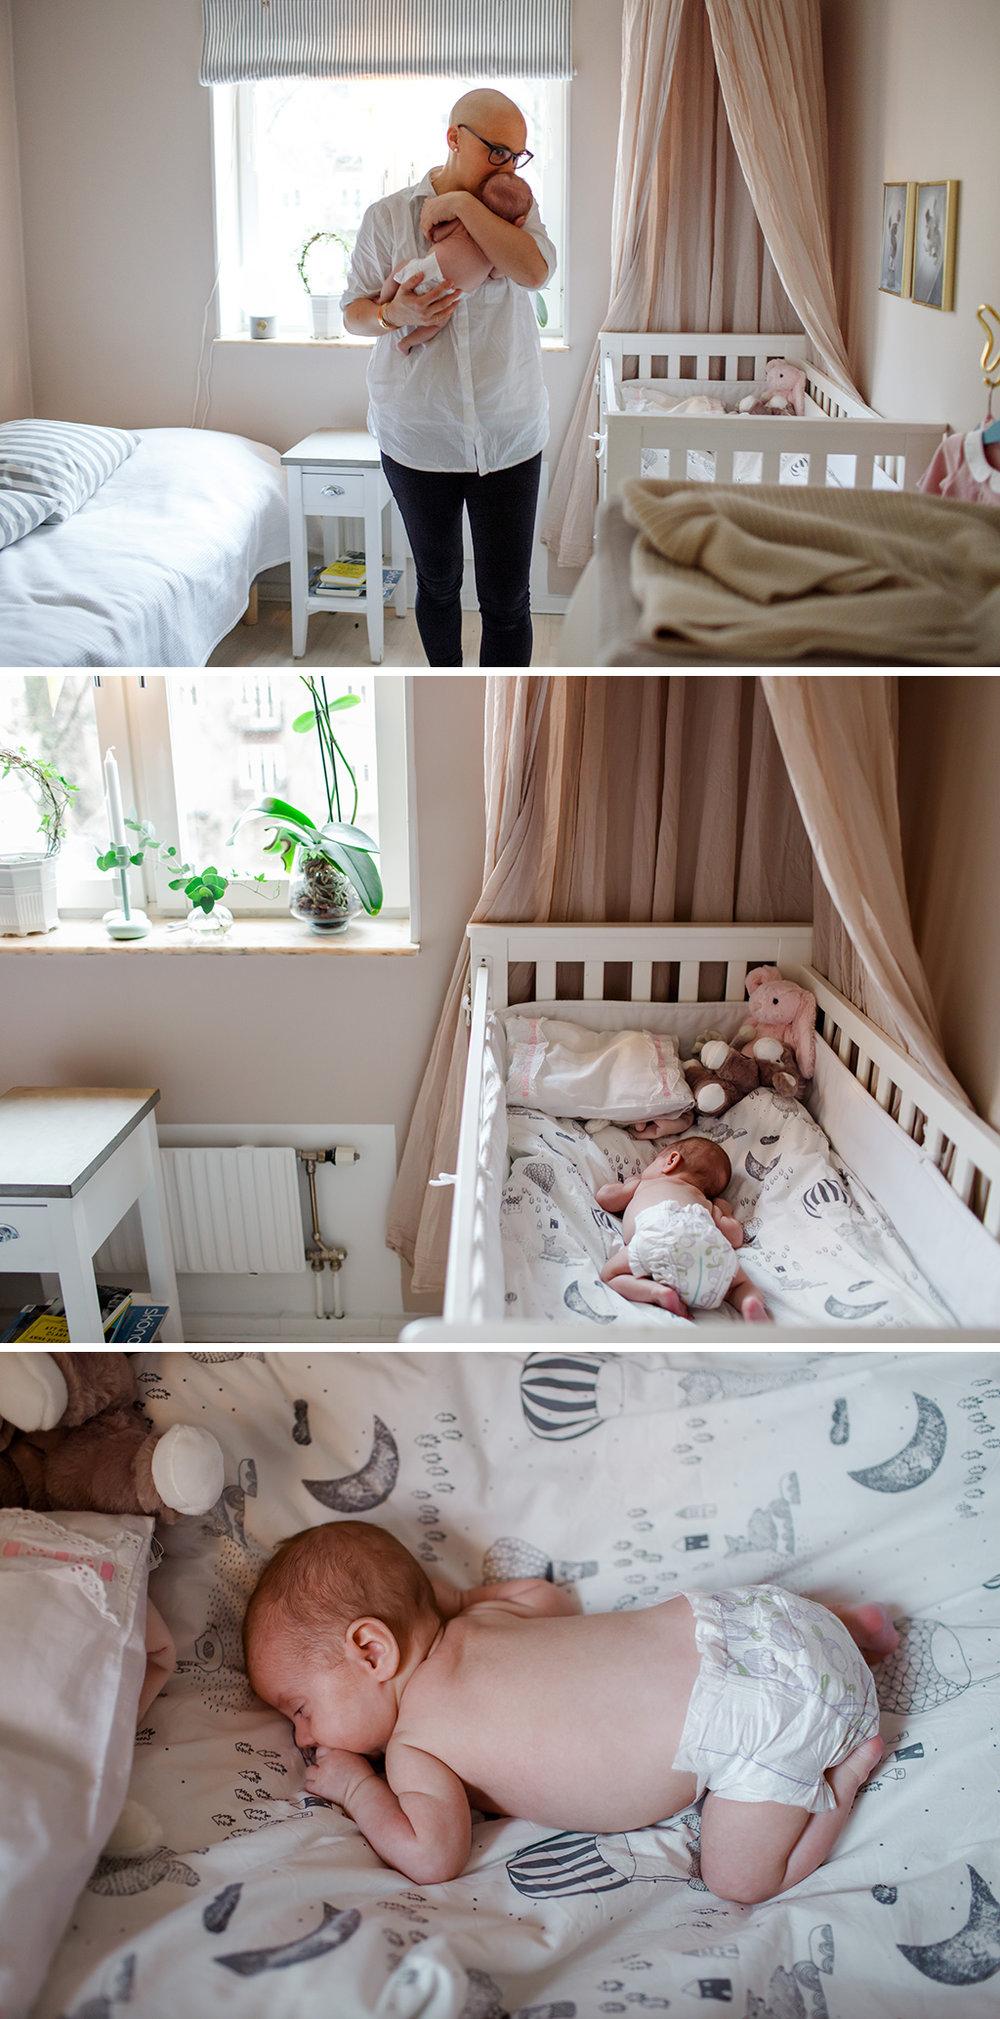 Lifestyle-nyfoddfotografering_newbornphotography_familjefotograf_Stockholm_19.jpg